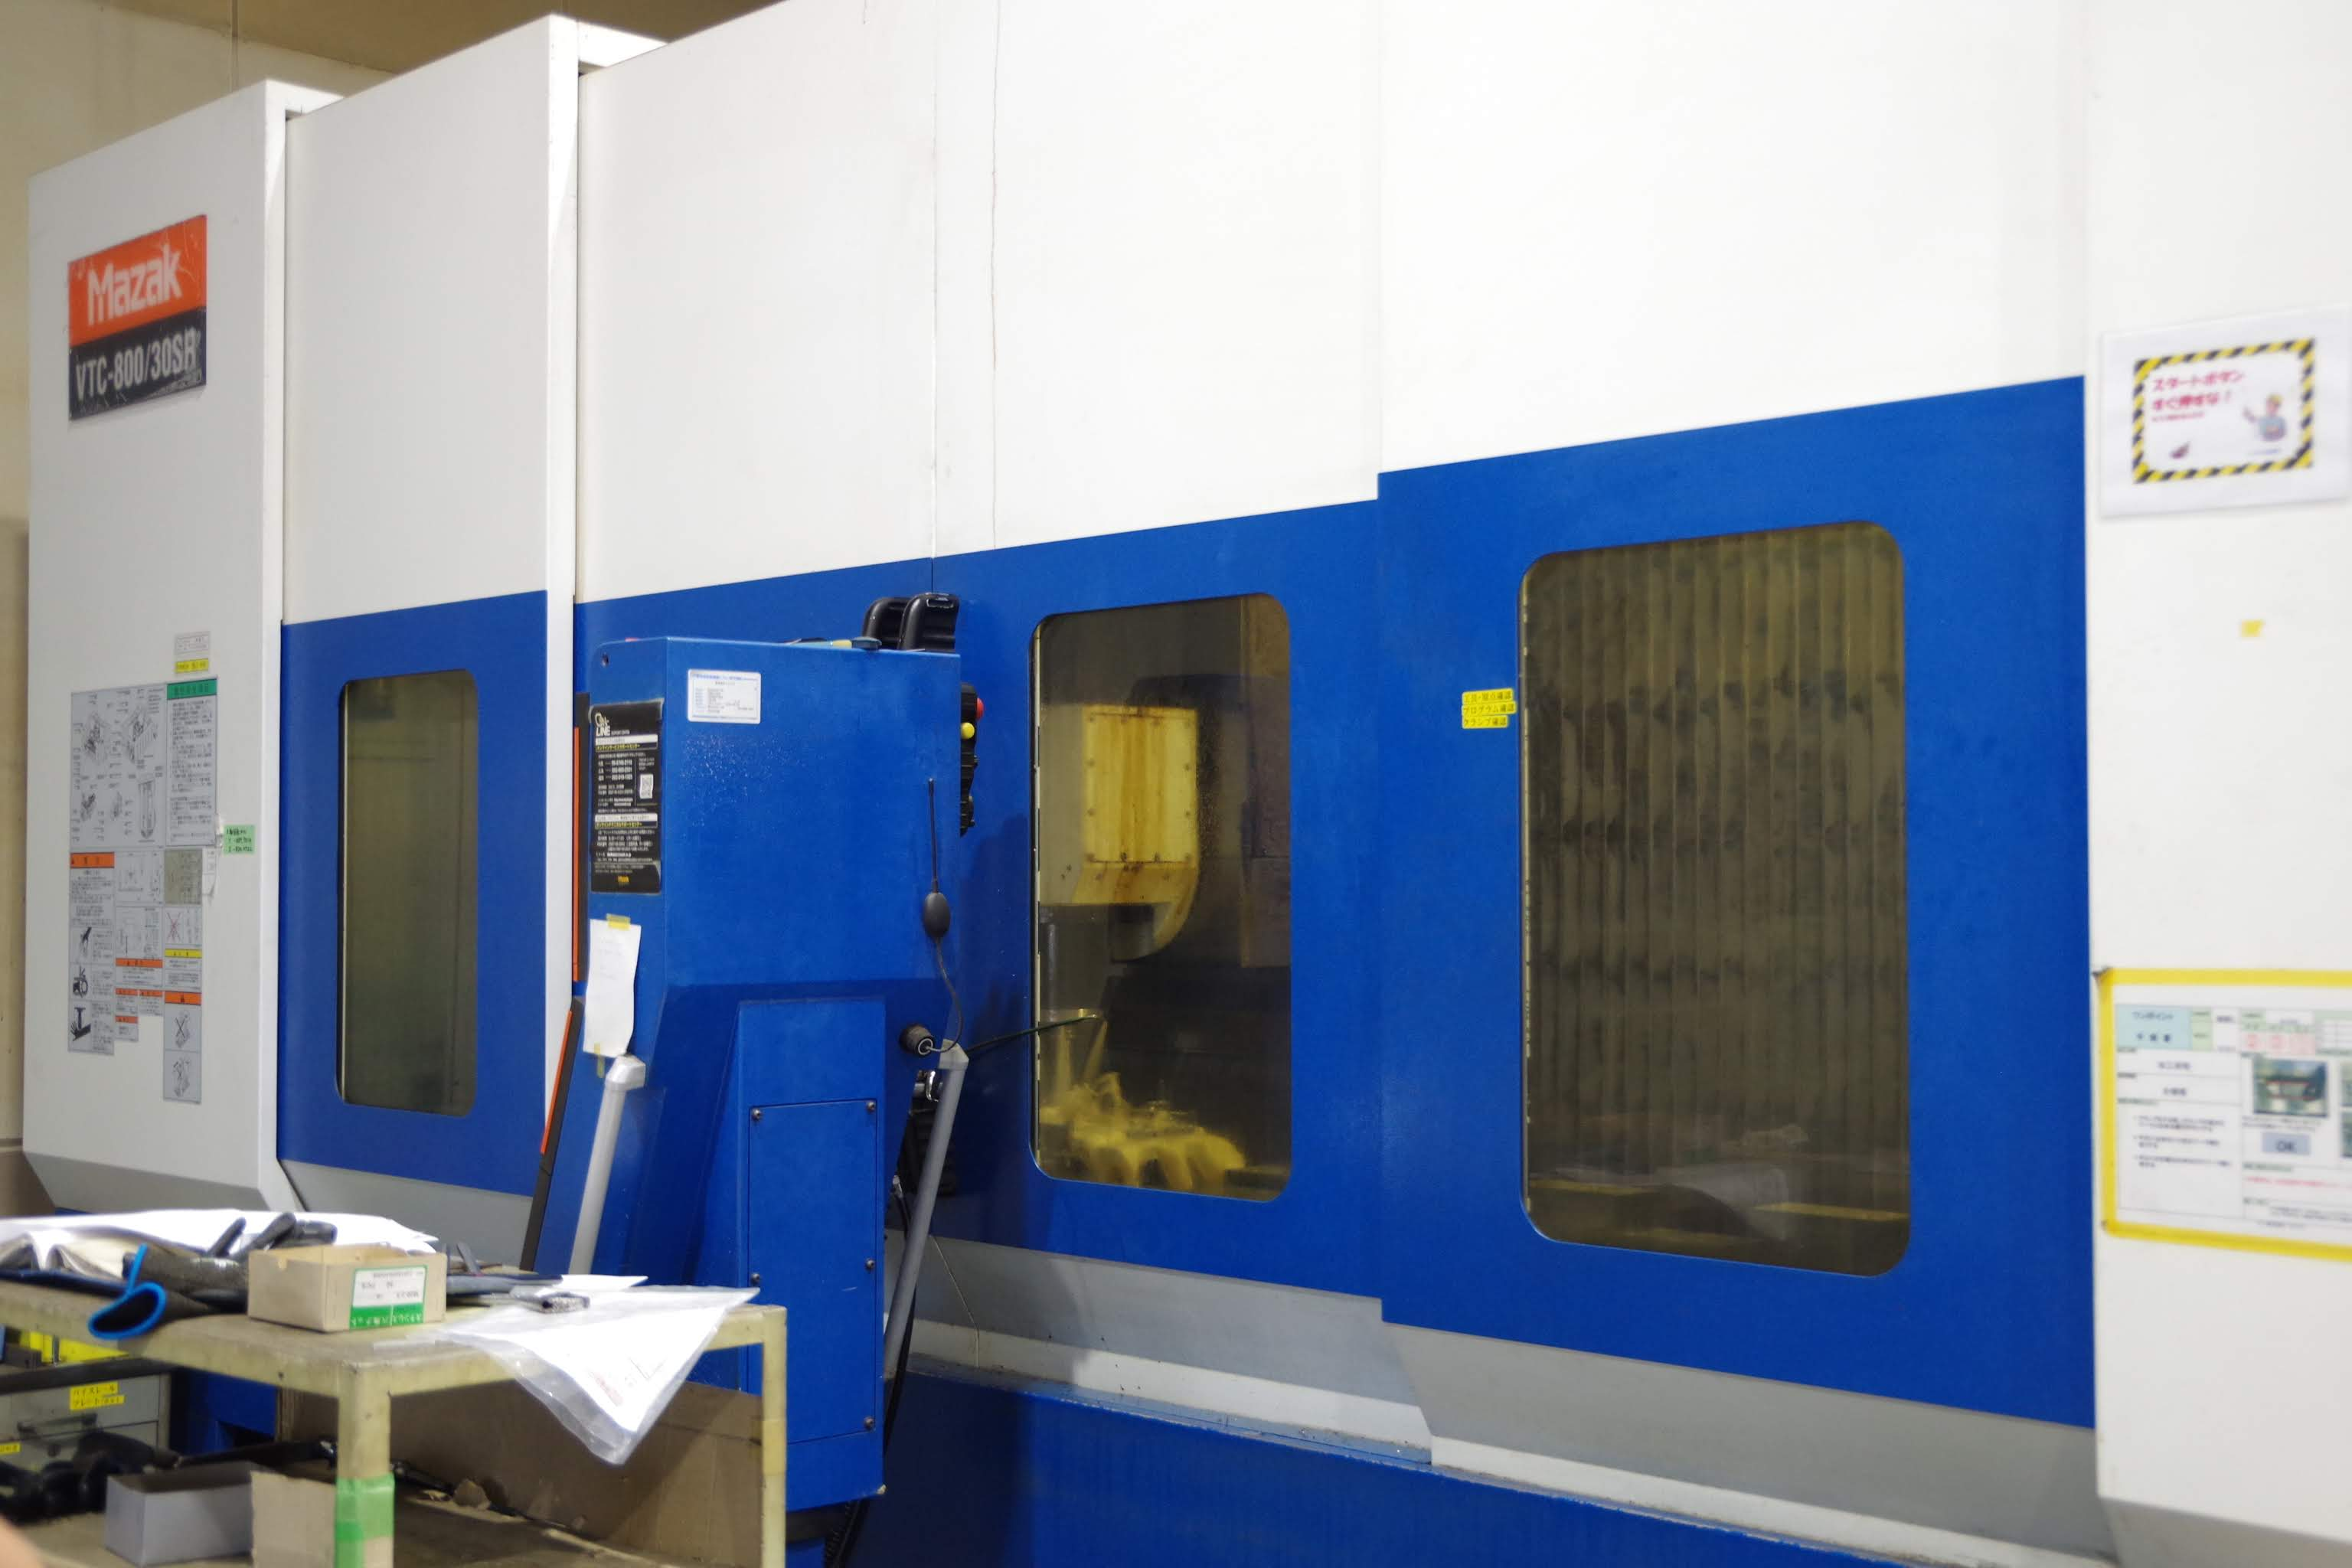 5軸加工機 VTC-800/30SR